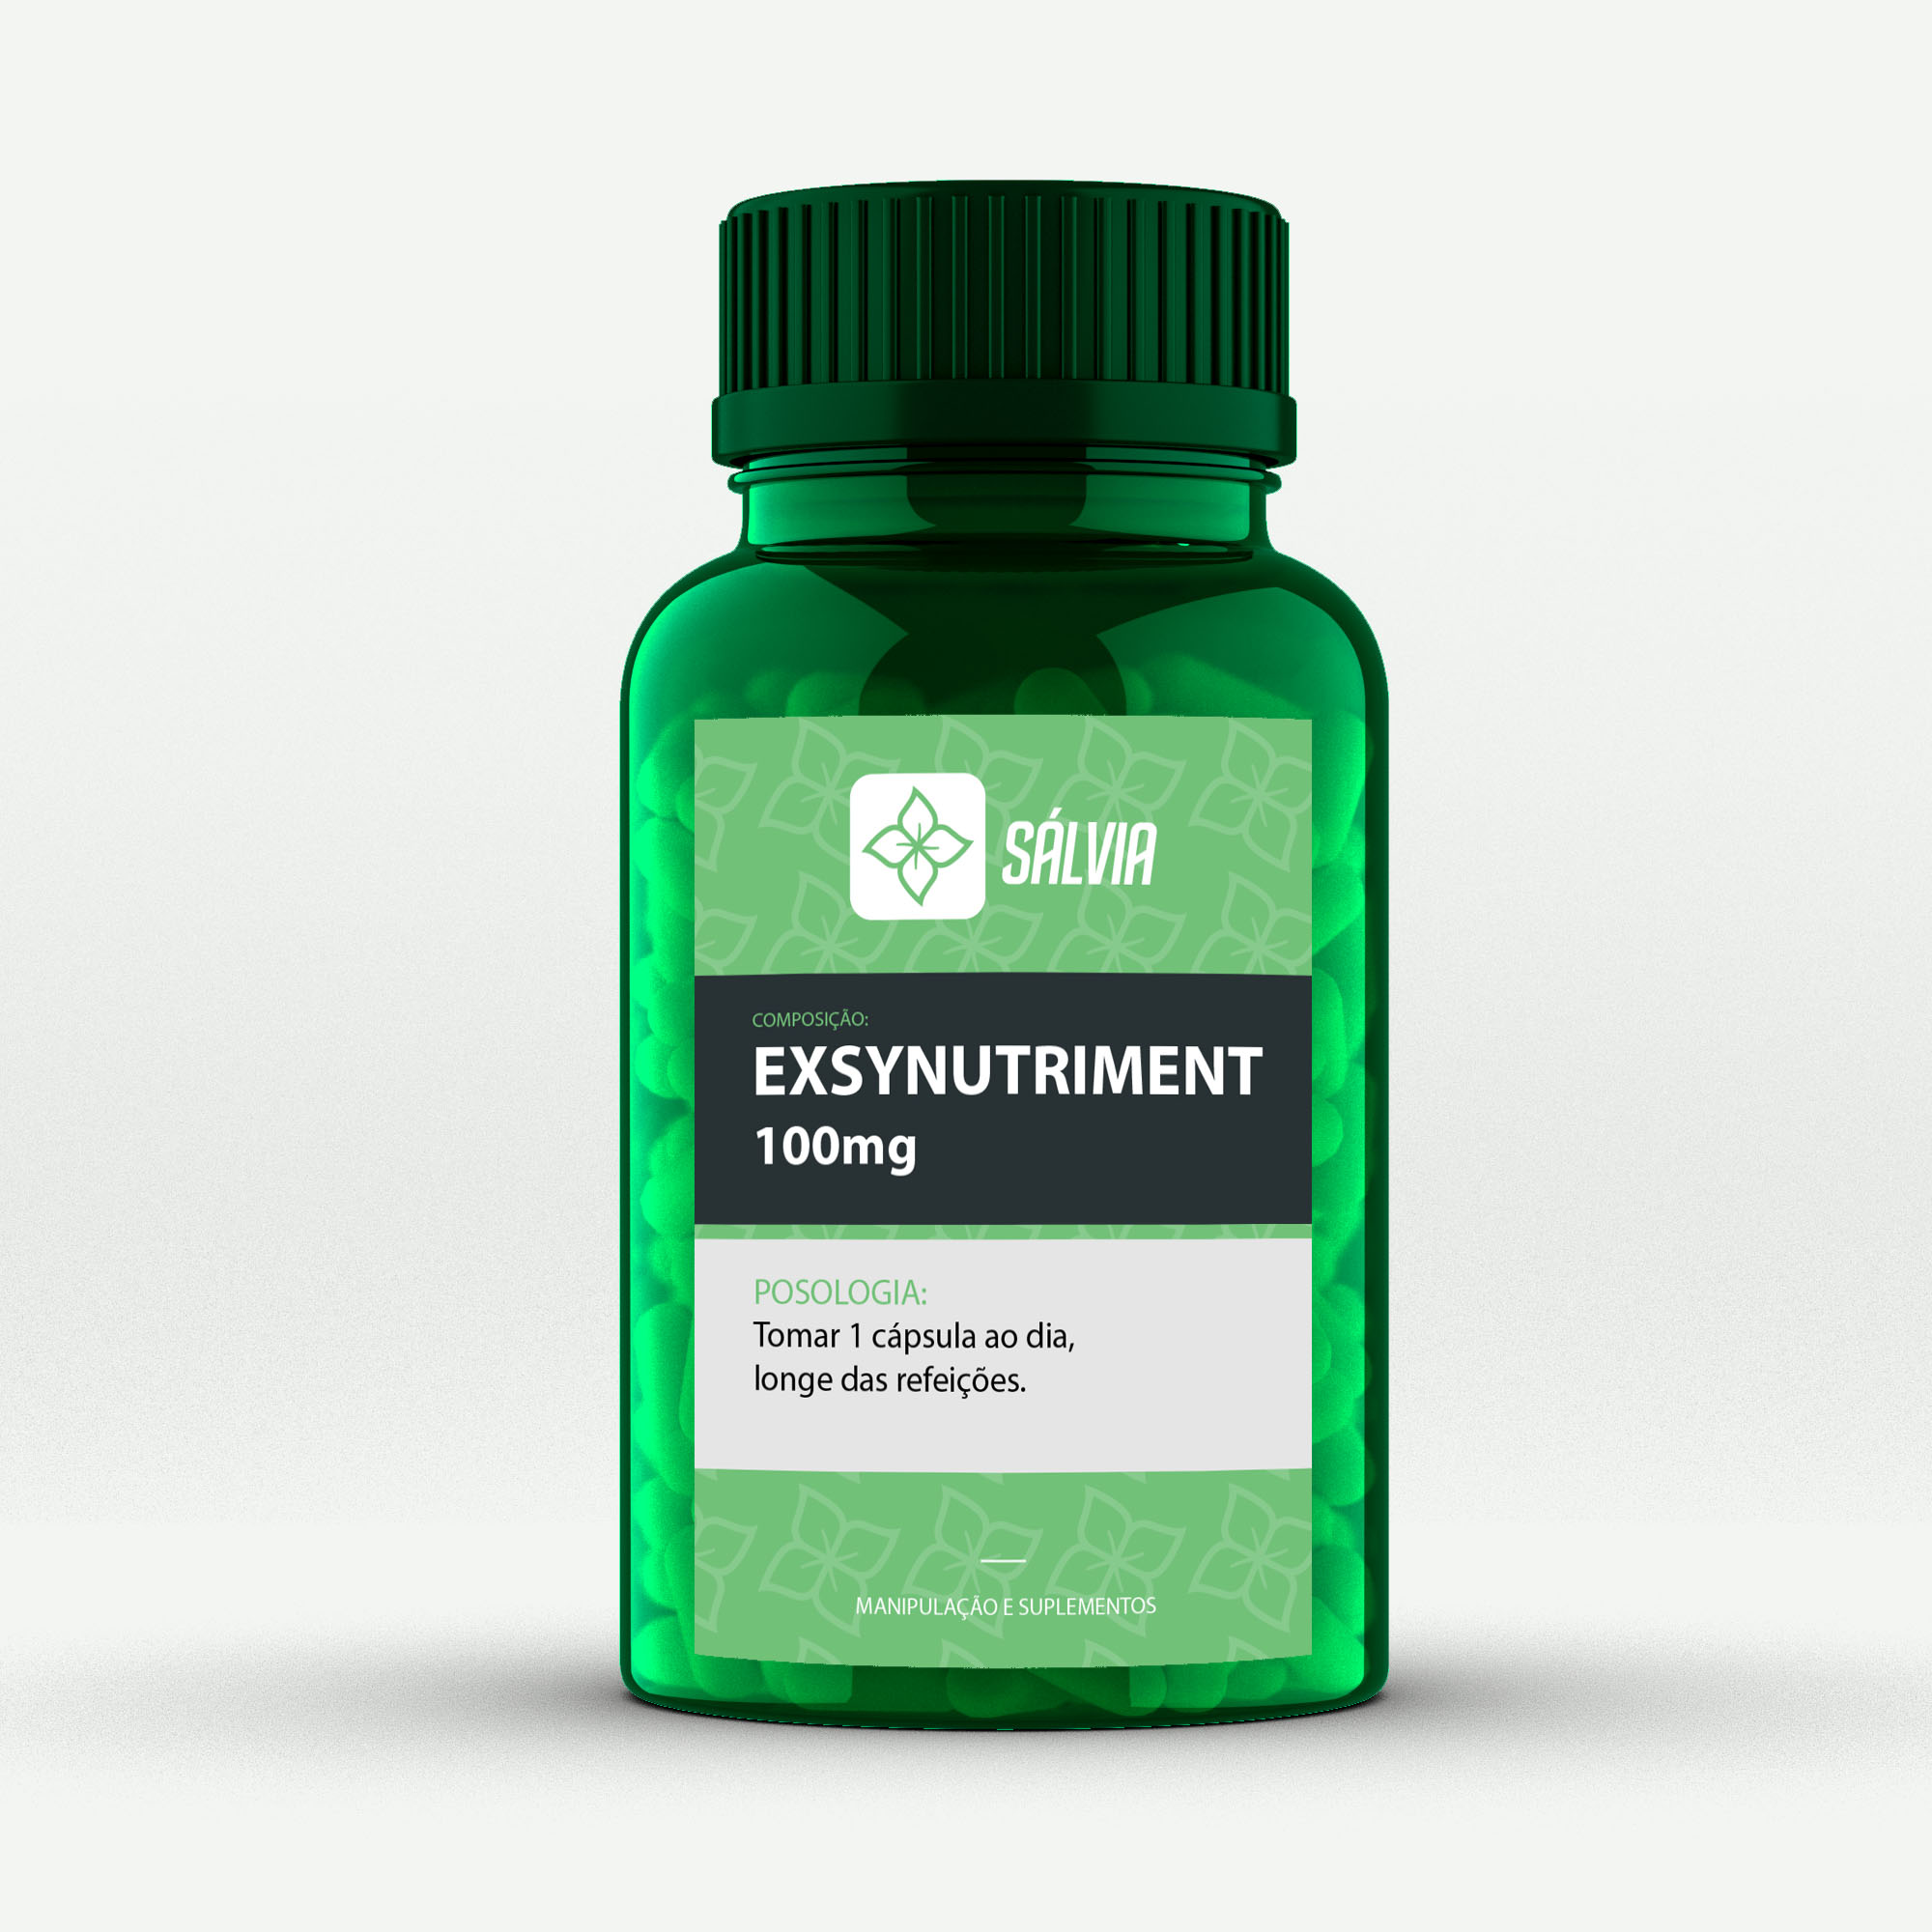 EXSYNUTRIMENT 100mg - Cápsulas